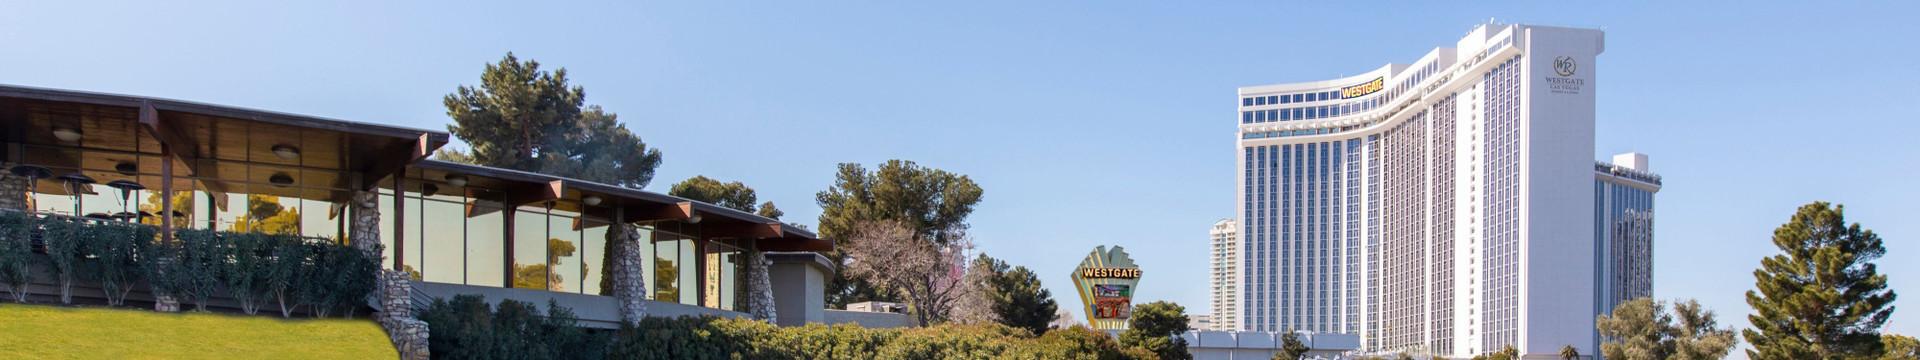 Awards for our Las Vegas, Nevada Hotel and Casino Resort | Award-Winning Las Vegas Resort